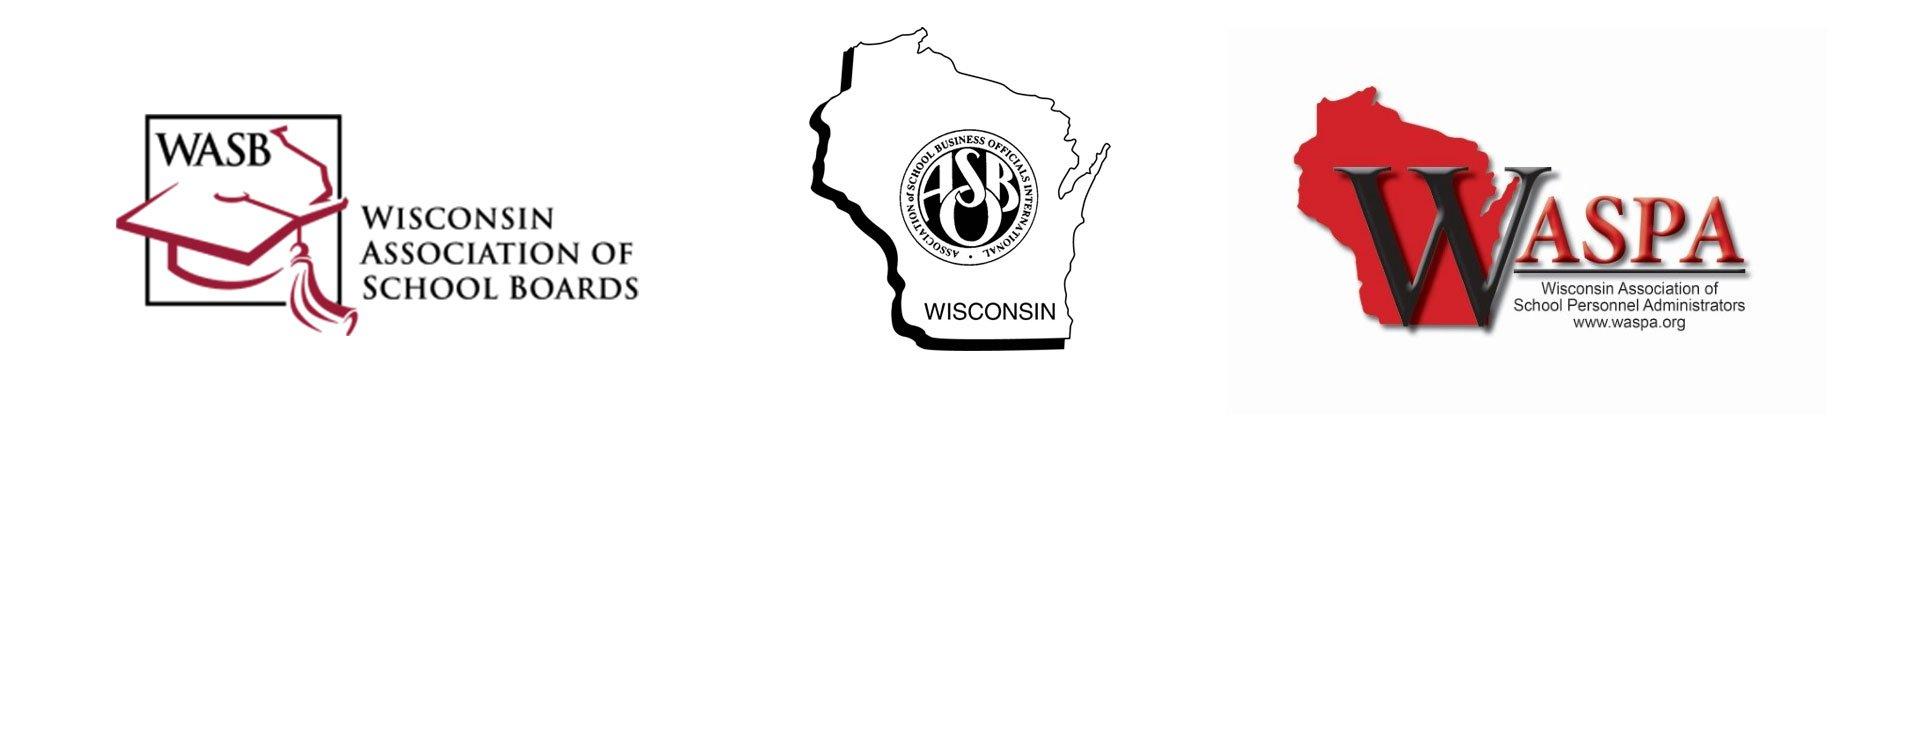 Interior-Page-Assoc-Logo-Layout---School-Associations